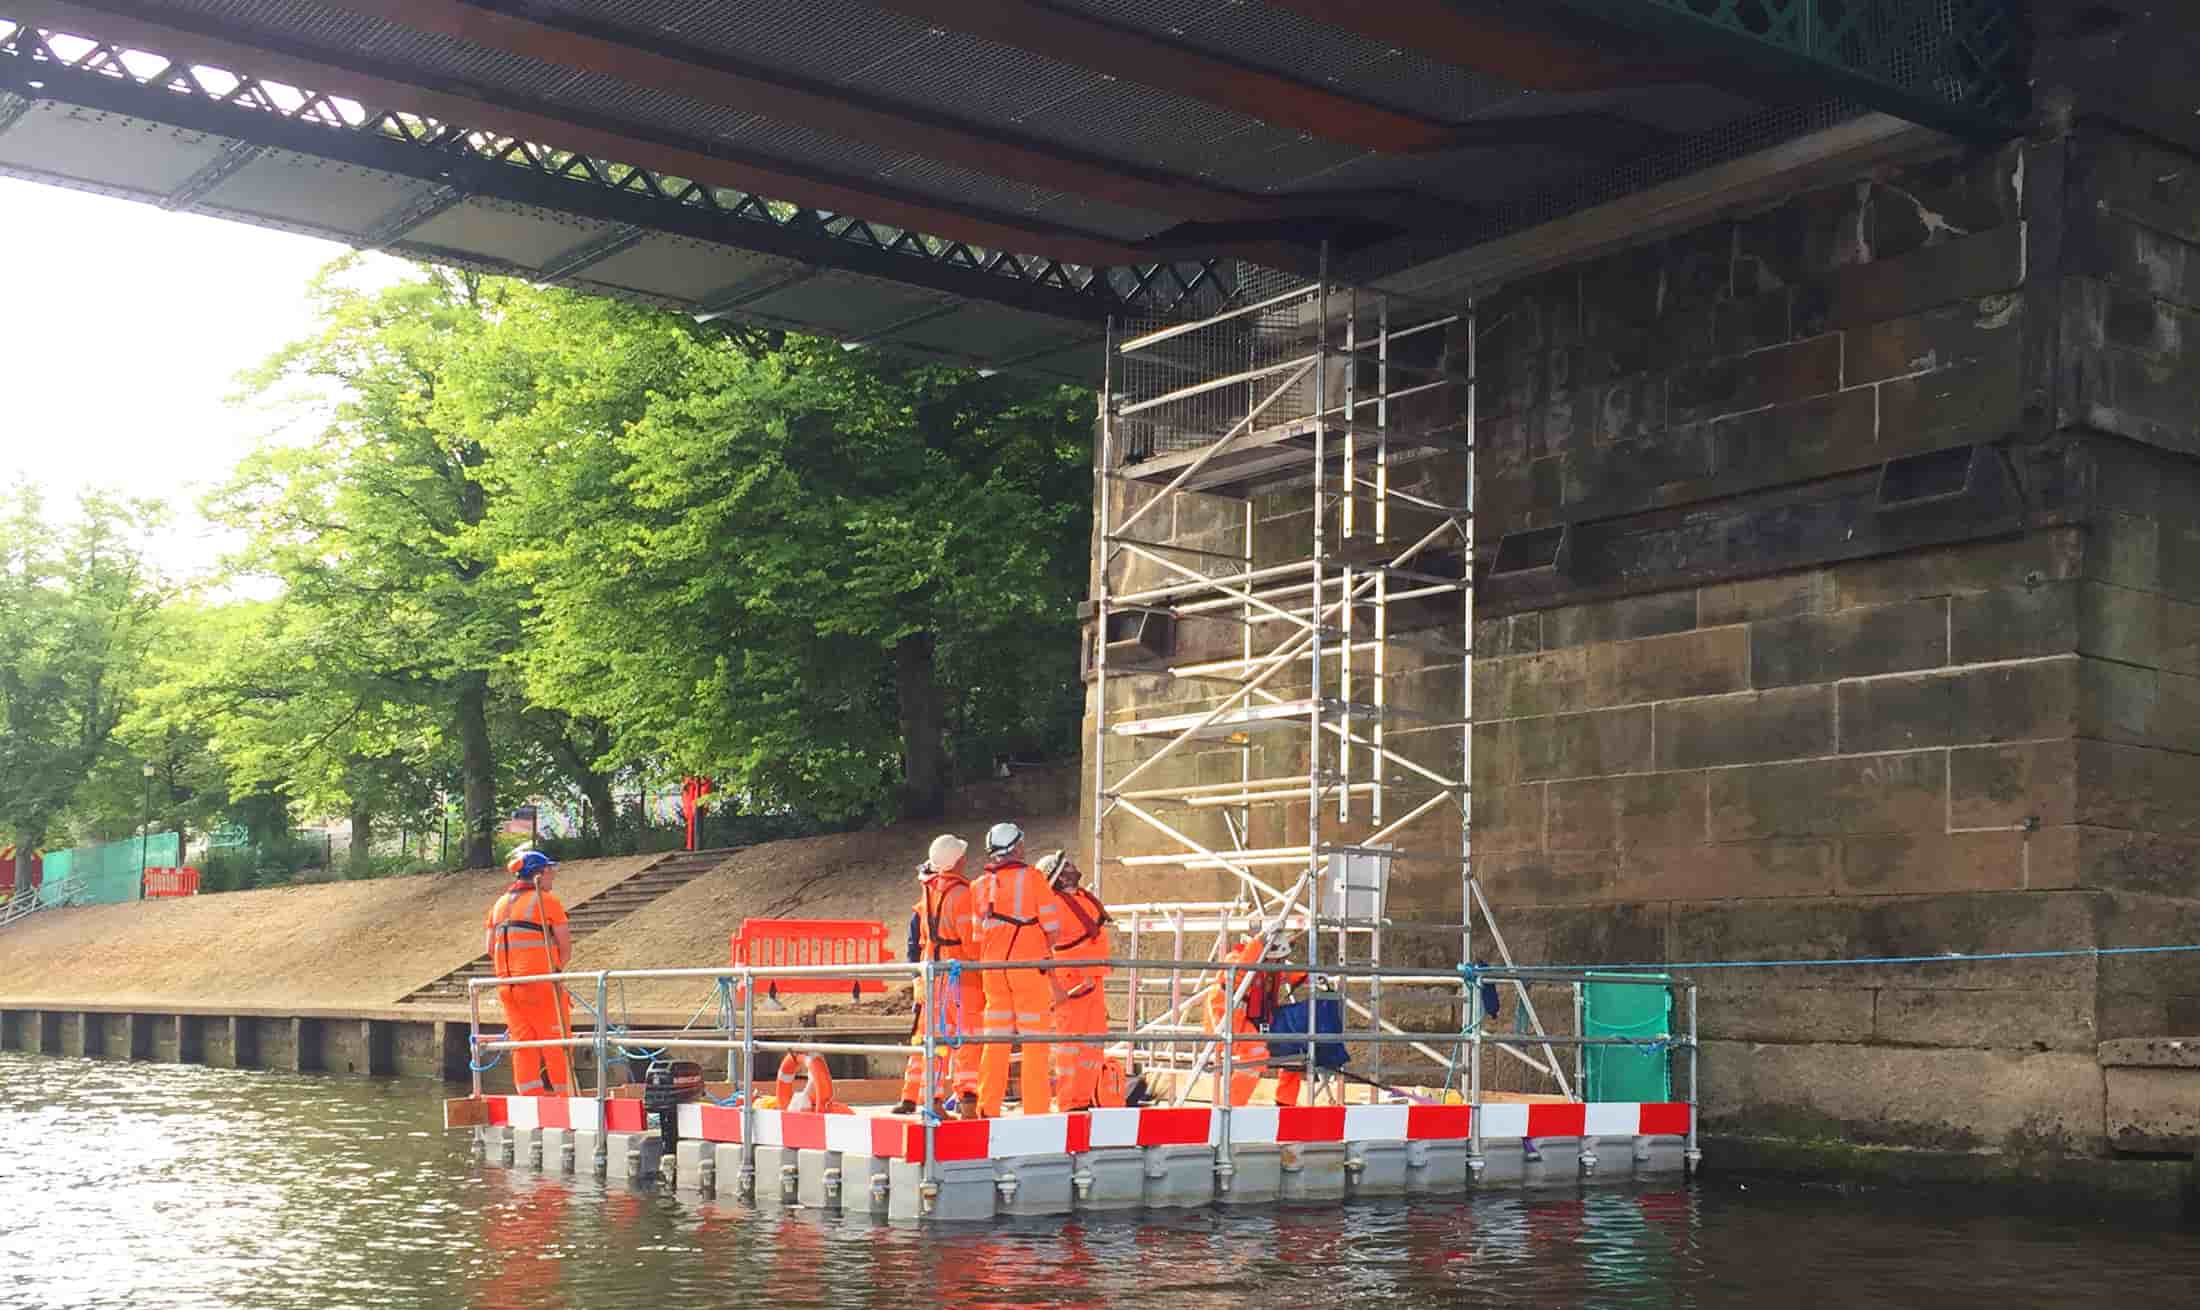 Floating Bridge Inspection Platforms Scaffold Tower